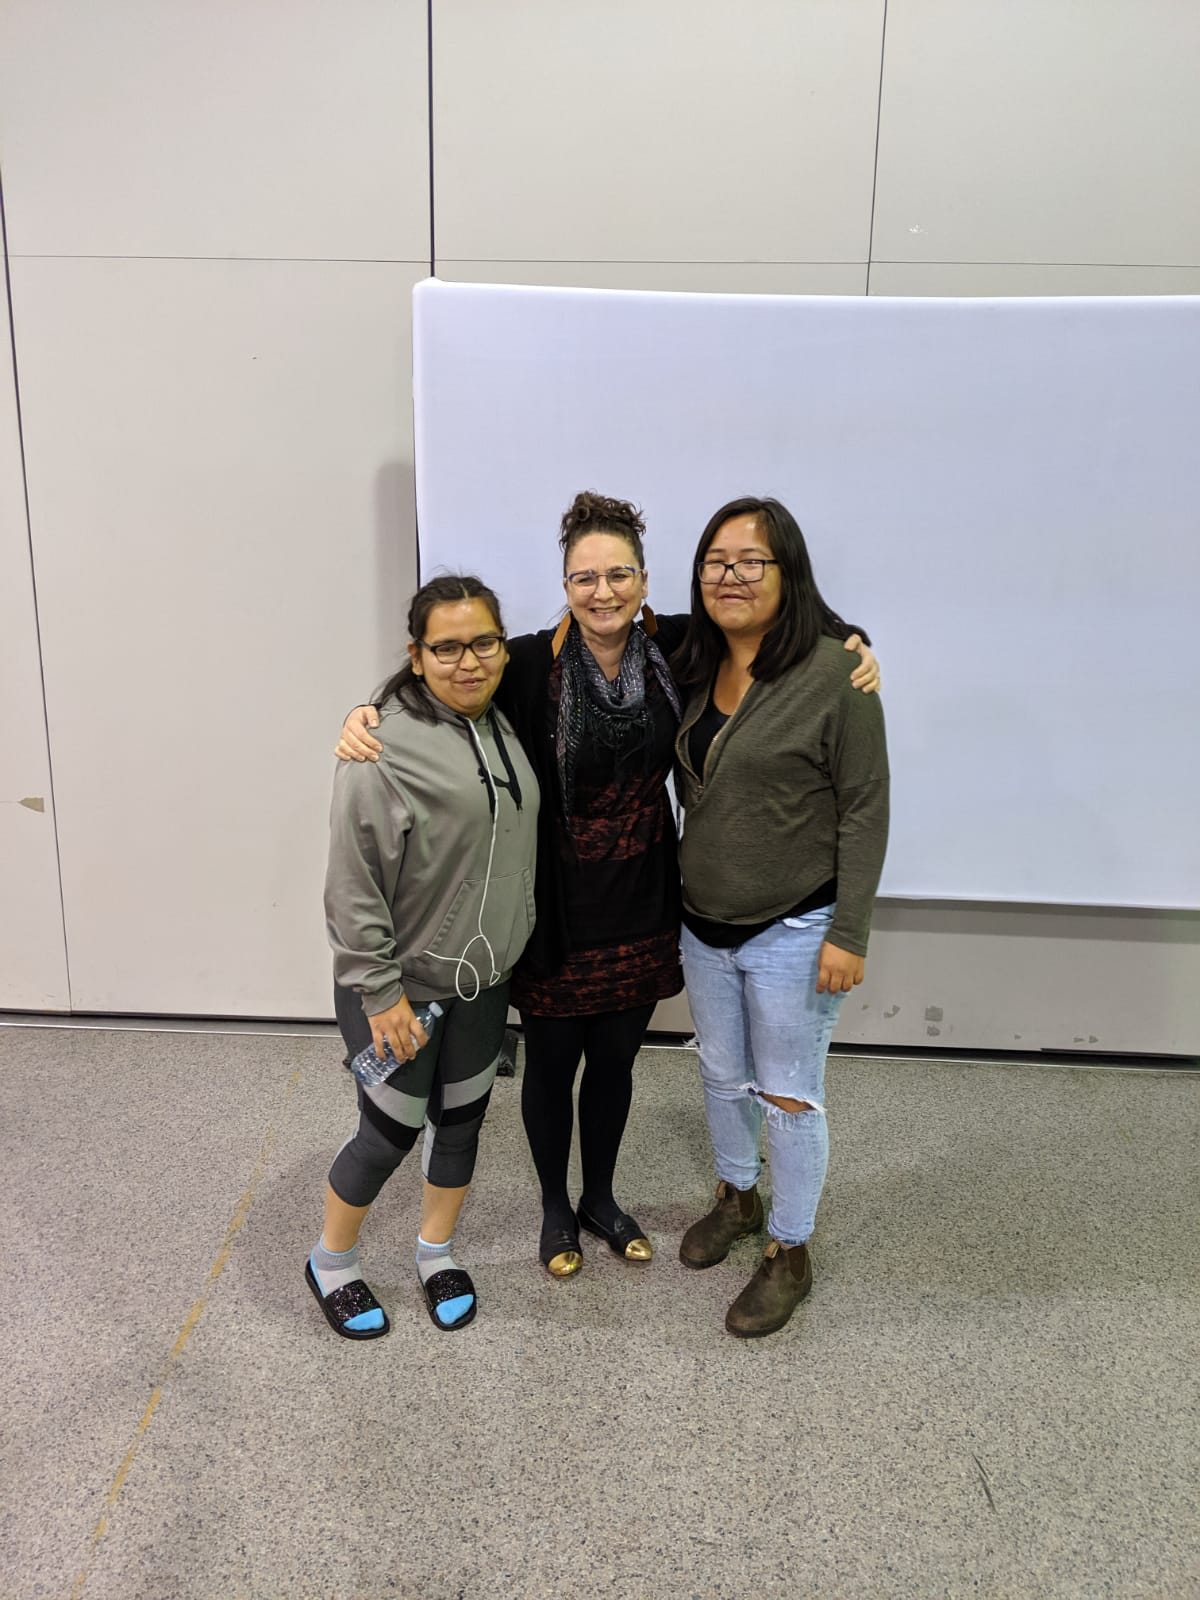 Kelly Anderson, Odessa Shuquaya & Roberta Williams